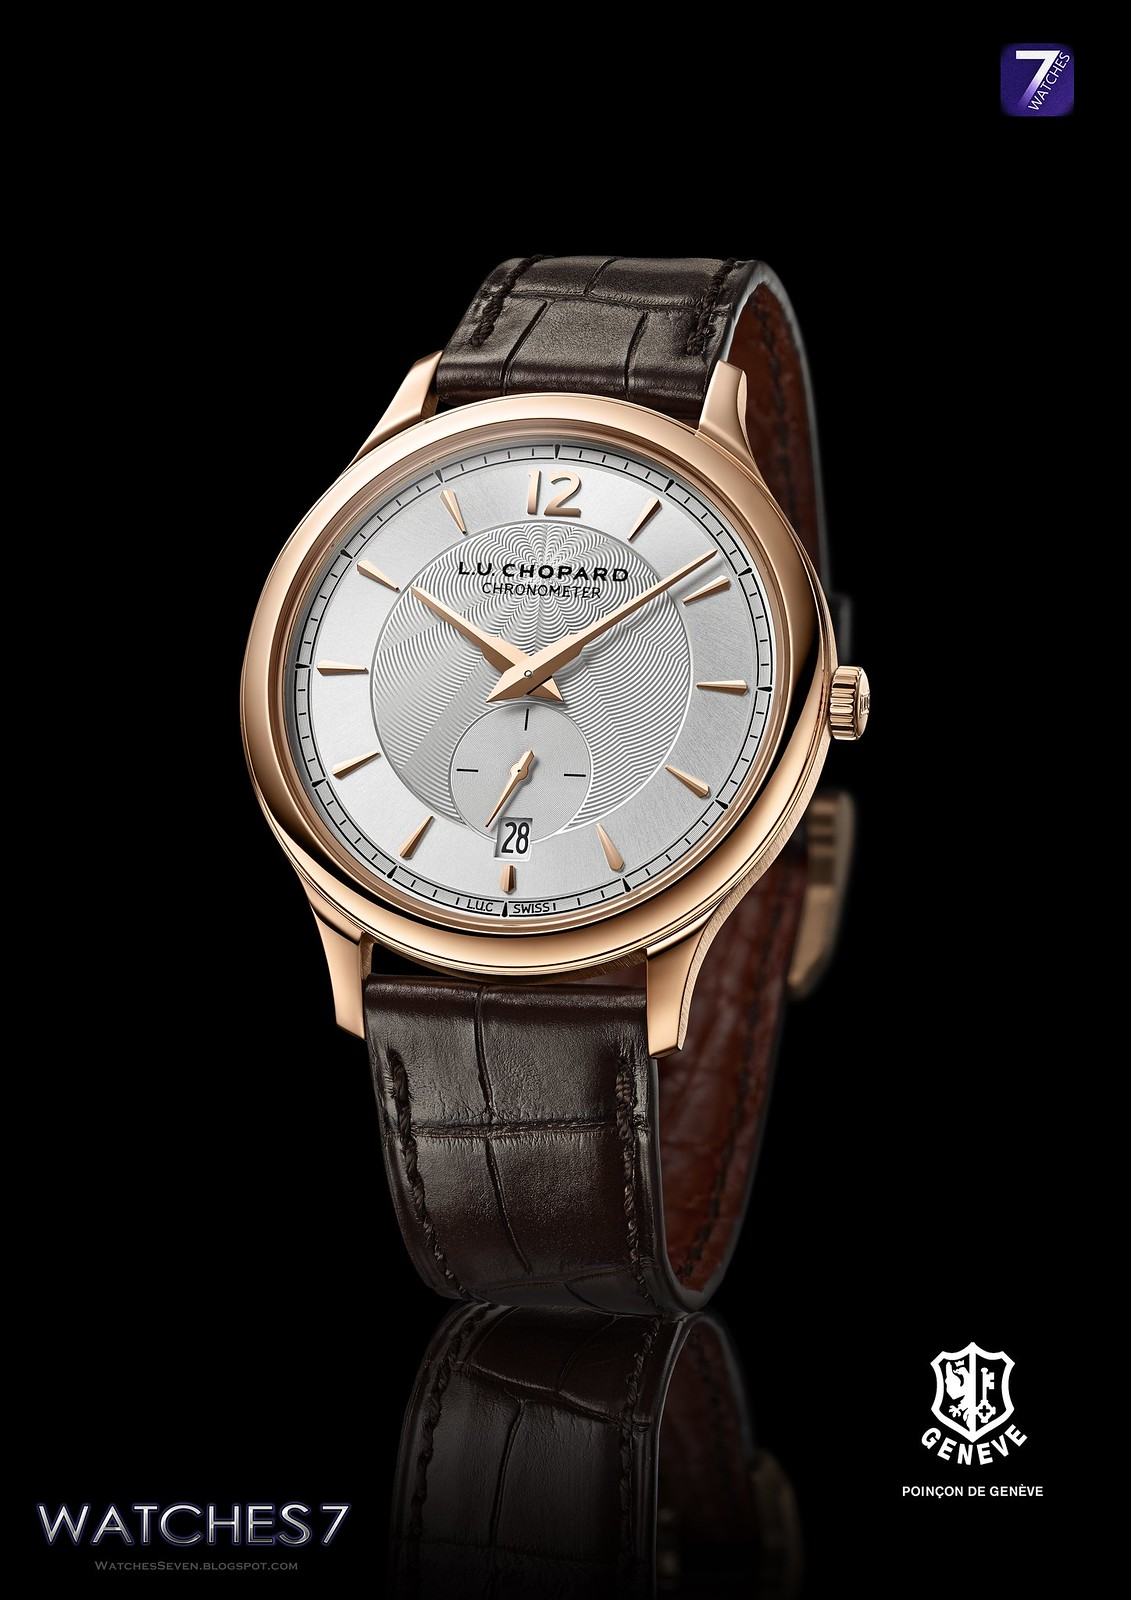 watches 7 chopard l u c xps 1860 ultra thin chronometer. Black Bedroom Furniture Sets. Home Design Ideas